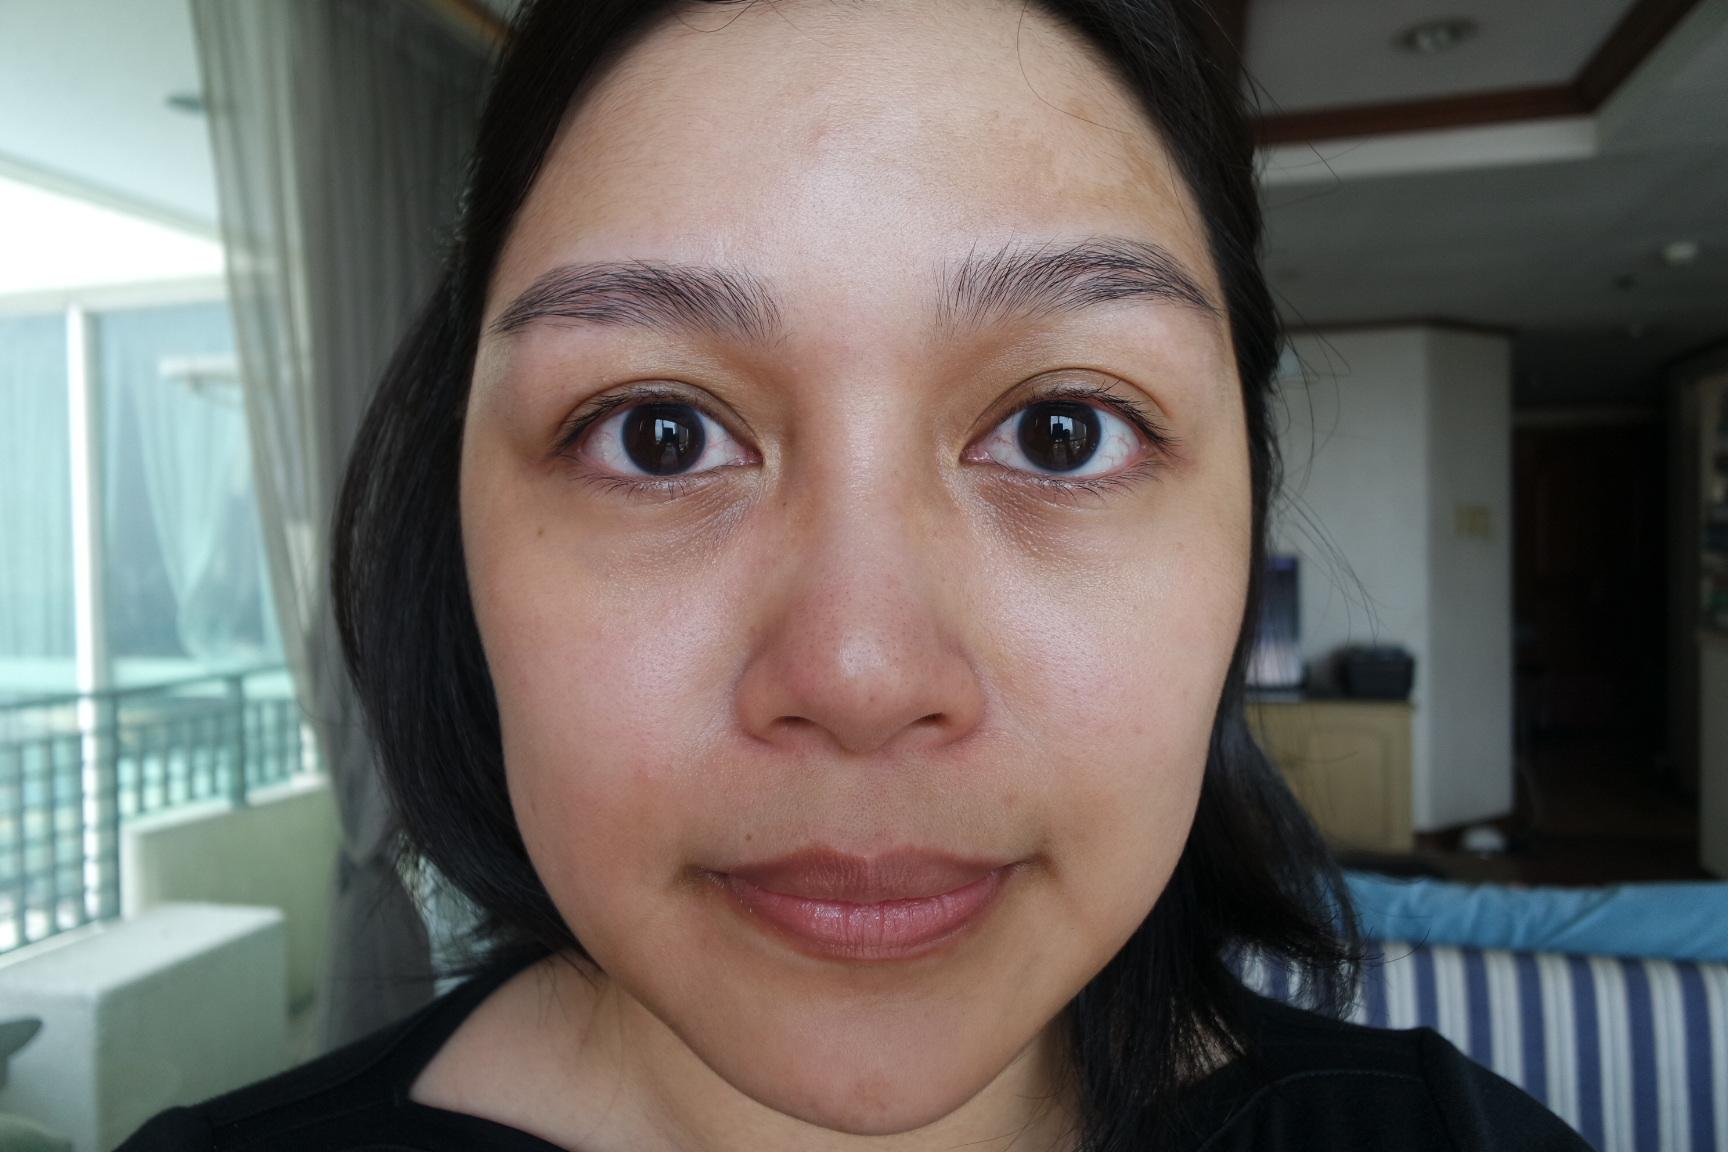 Den's bare face, with eye cream applied